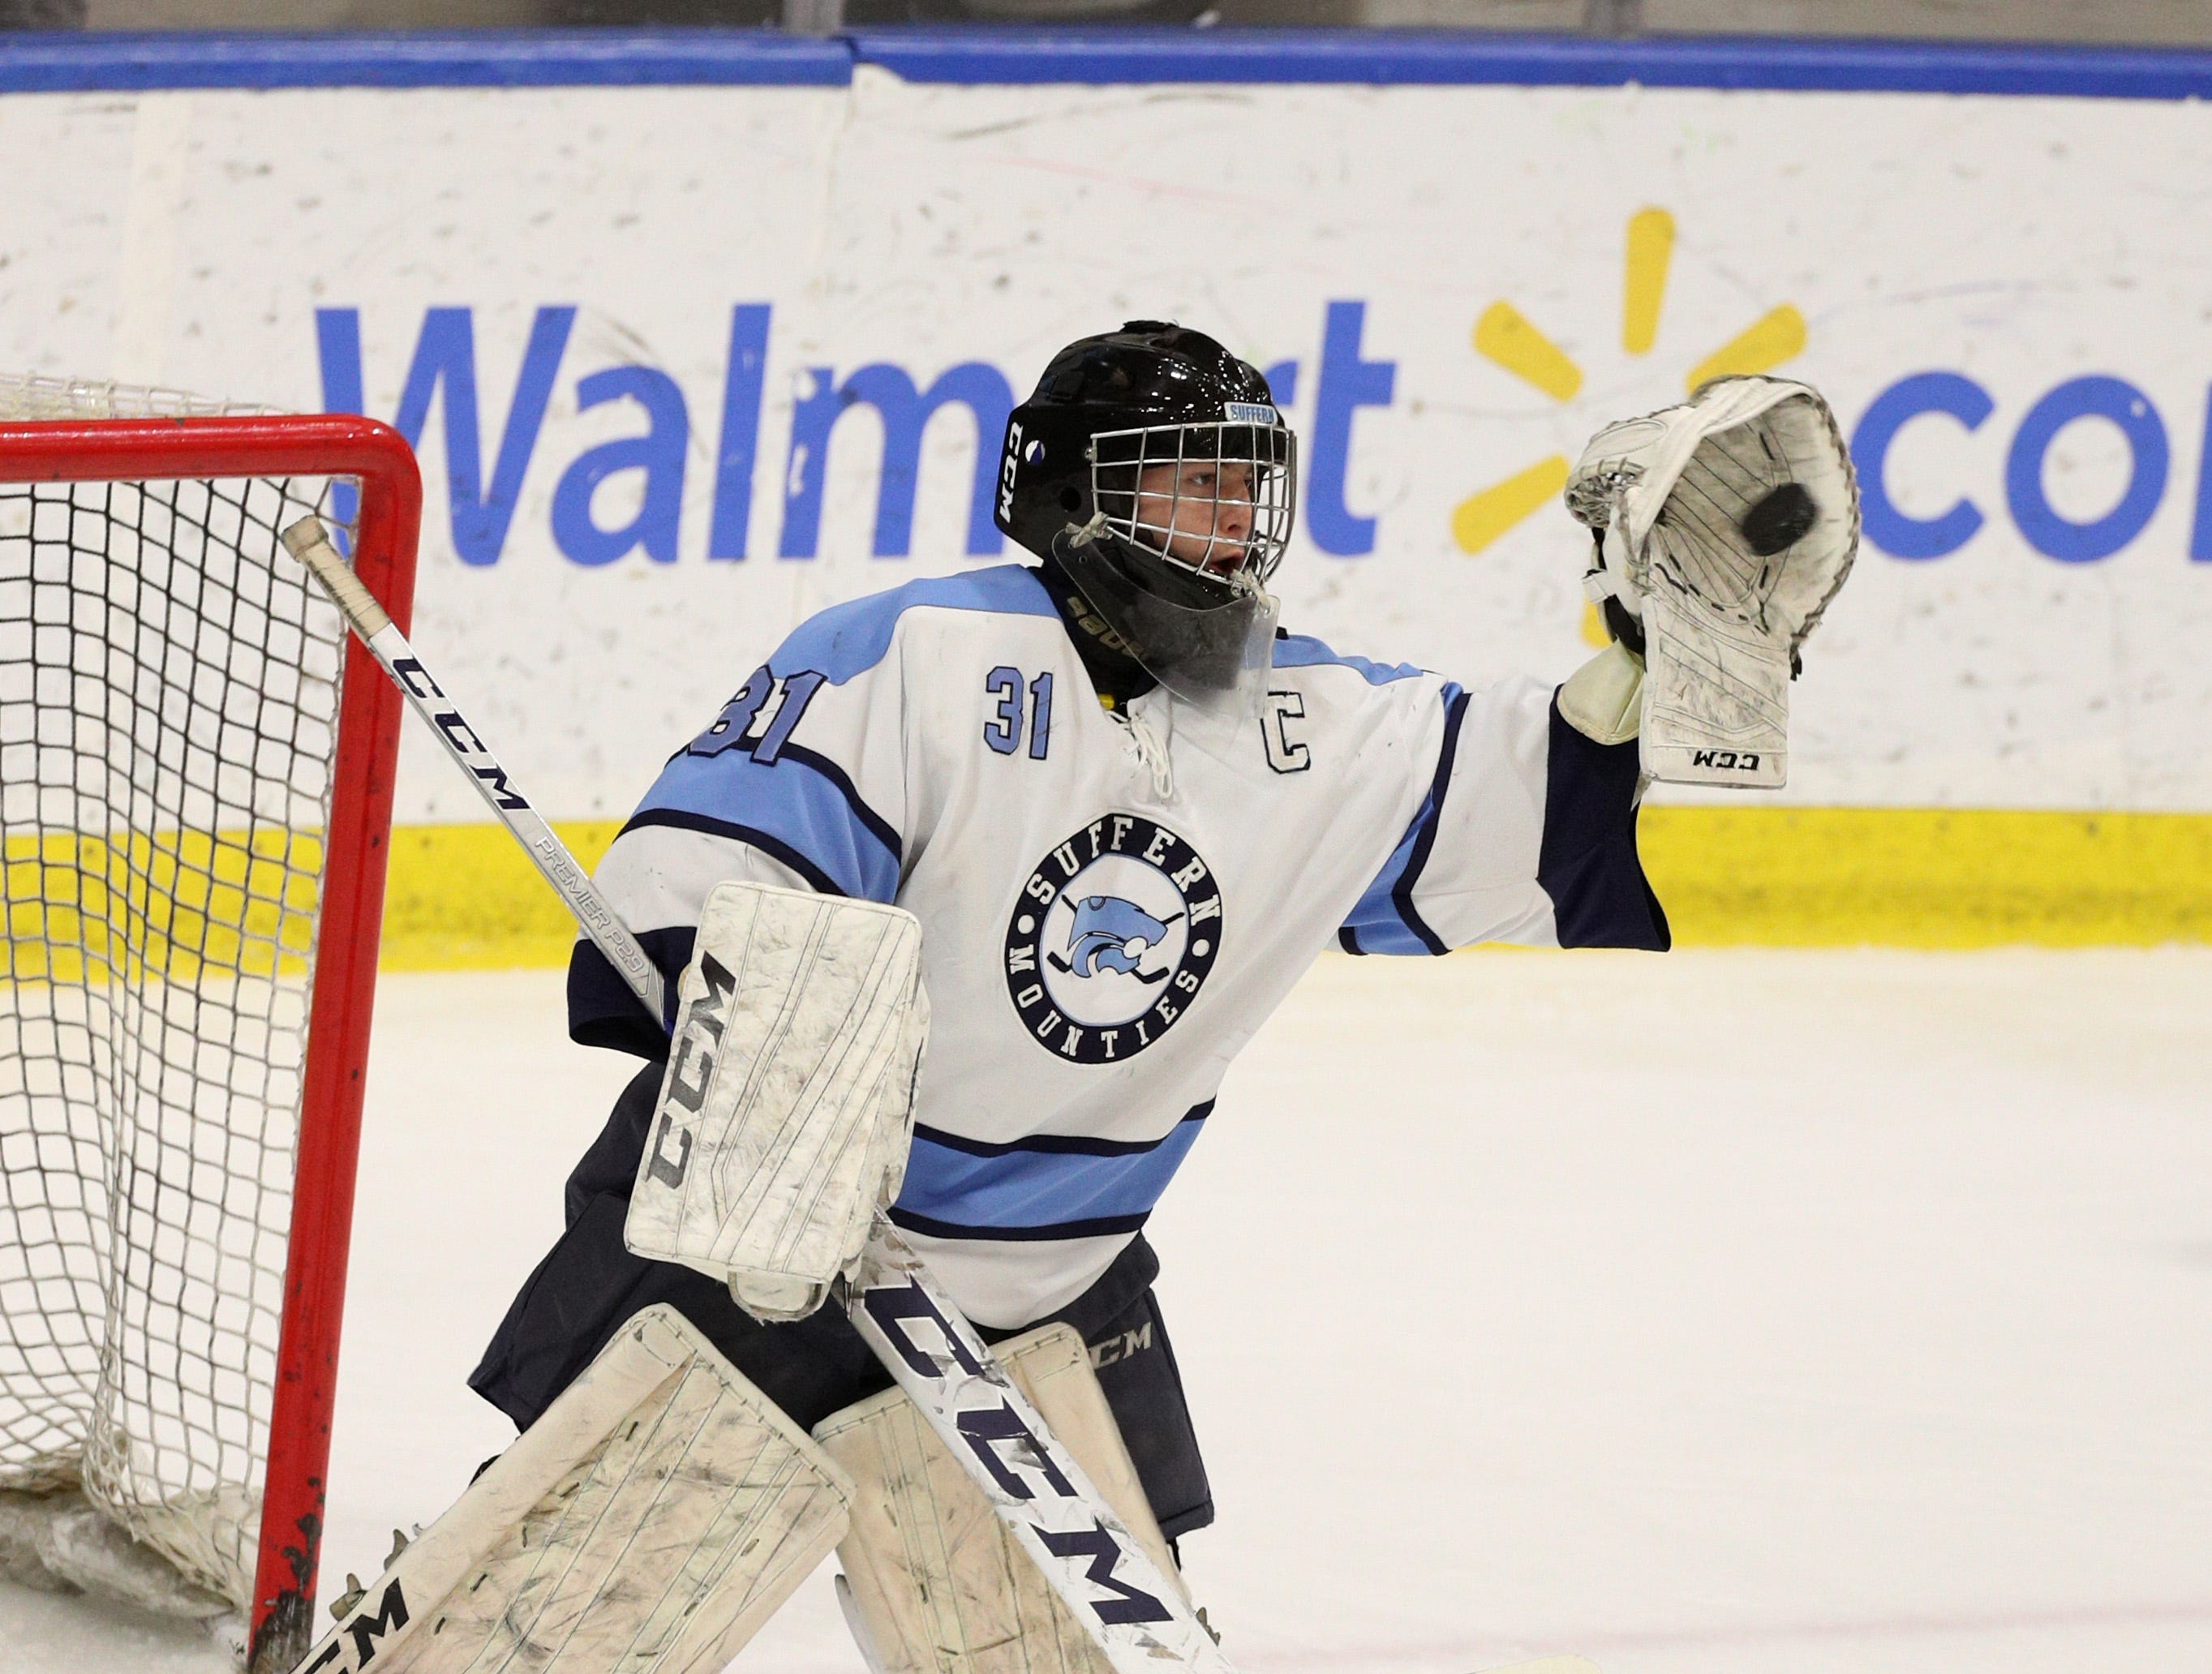 Surrern goalie Mike Harper makes a glove save.